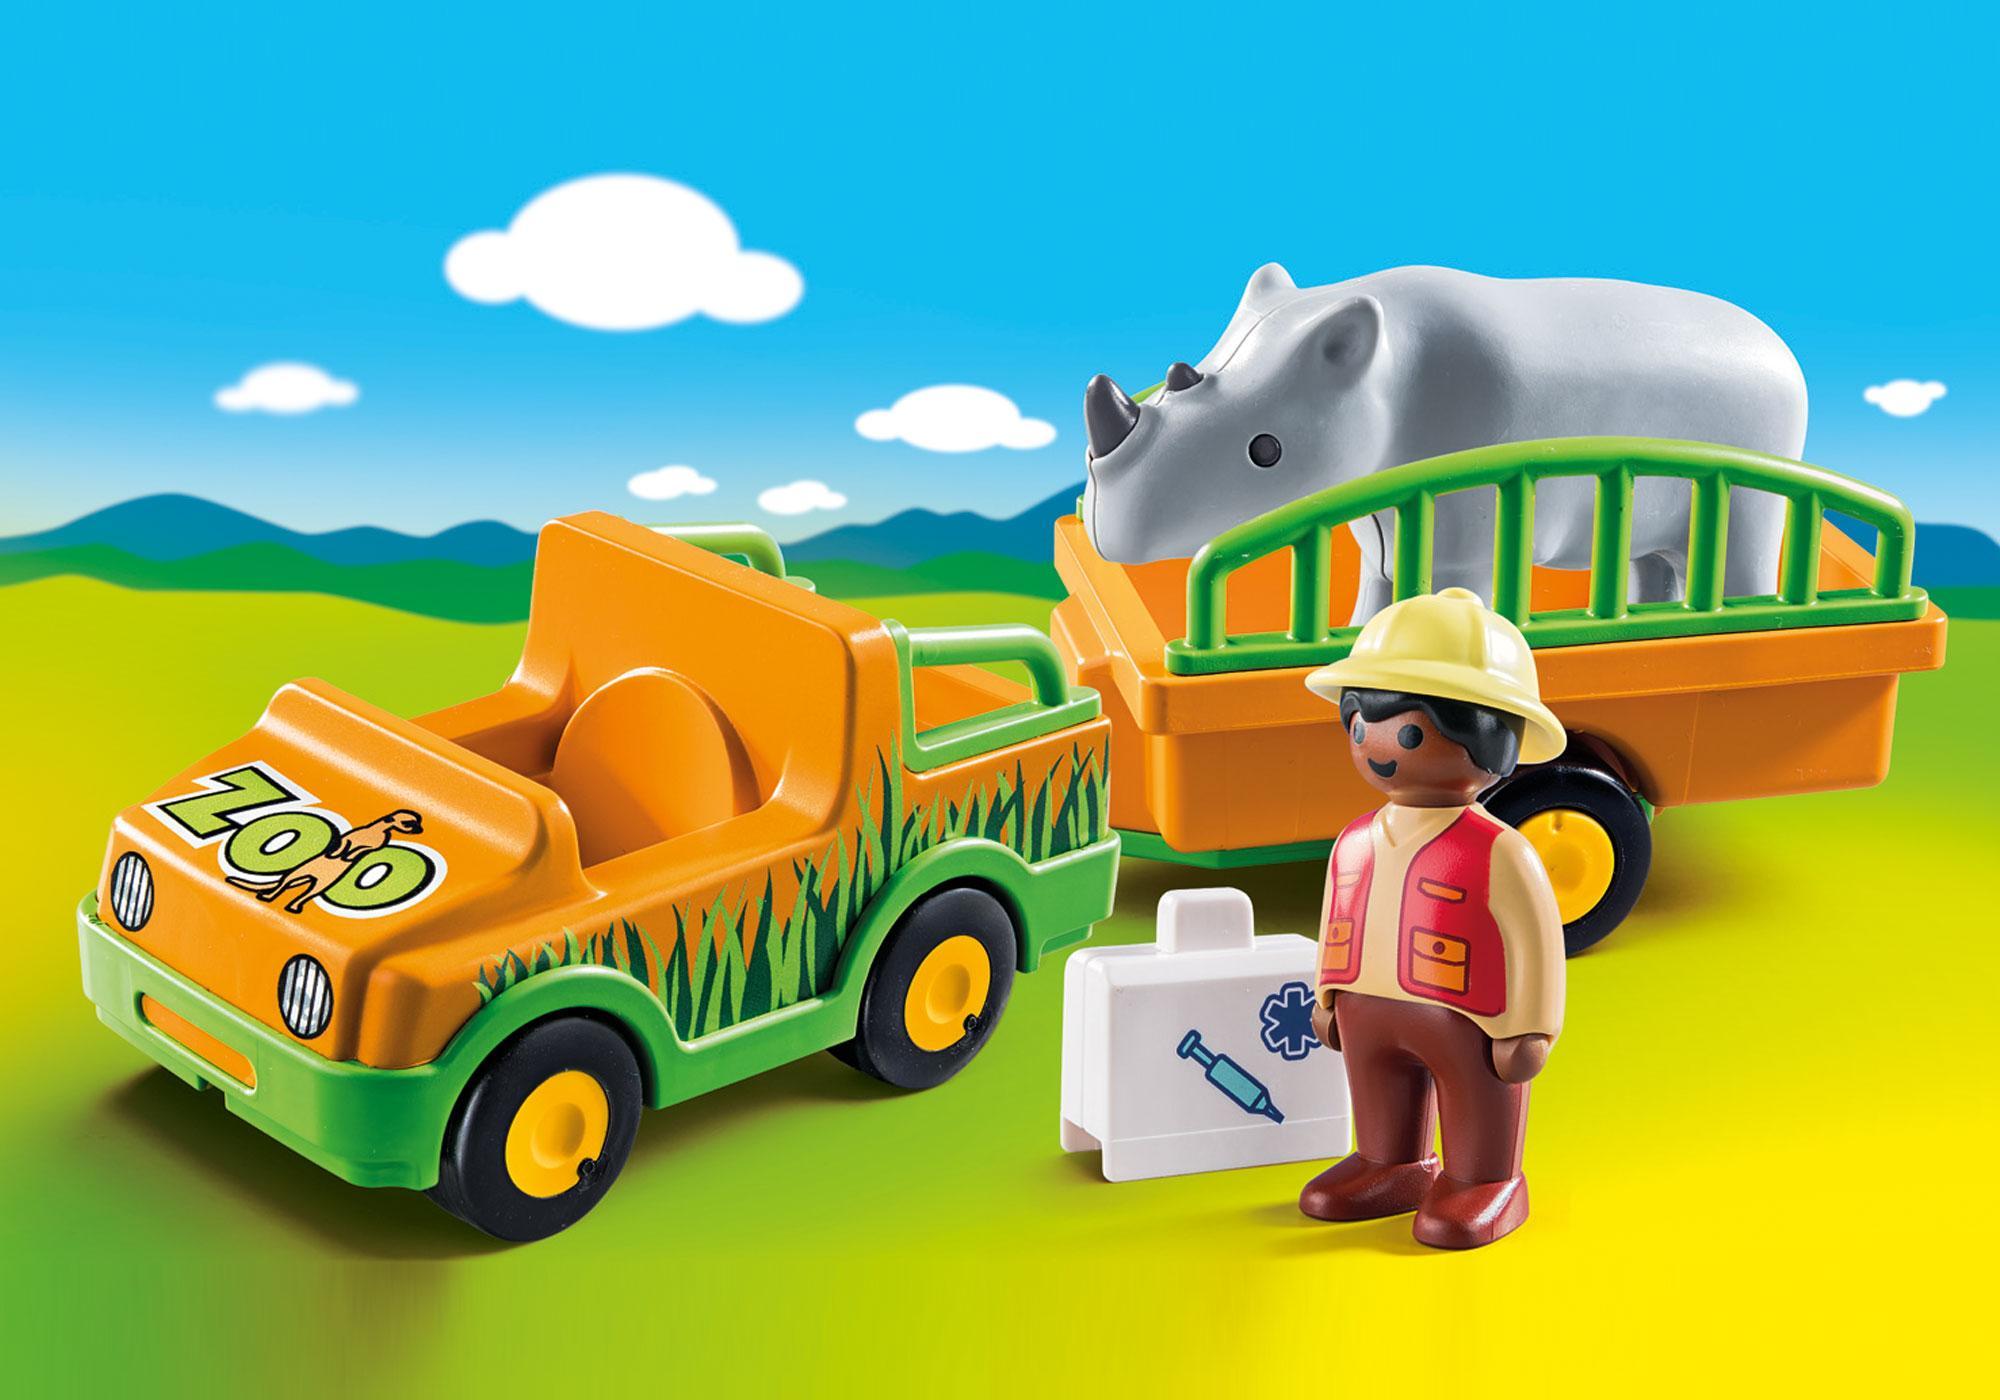 70182_product_detail/Zoofahrzeug mit Nashorn